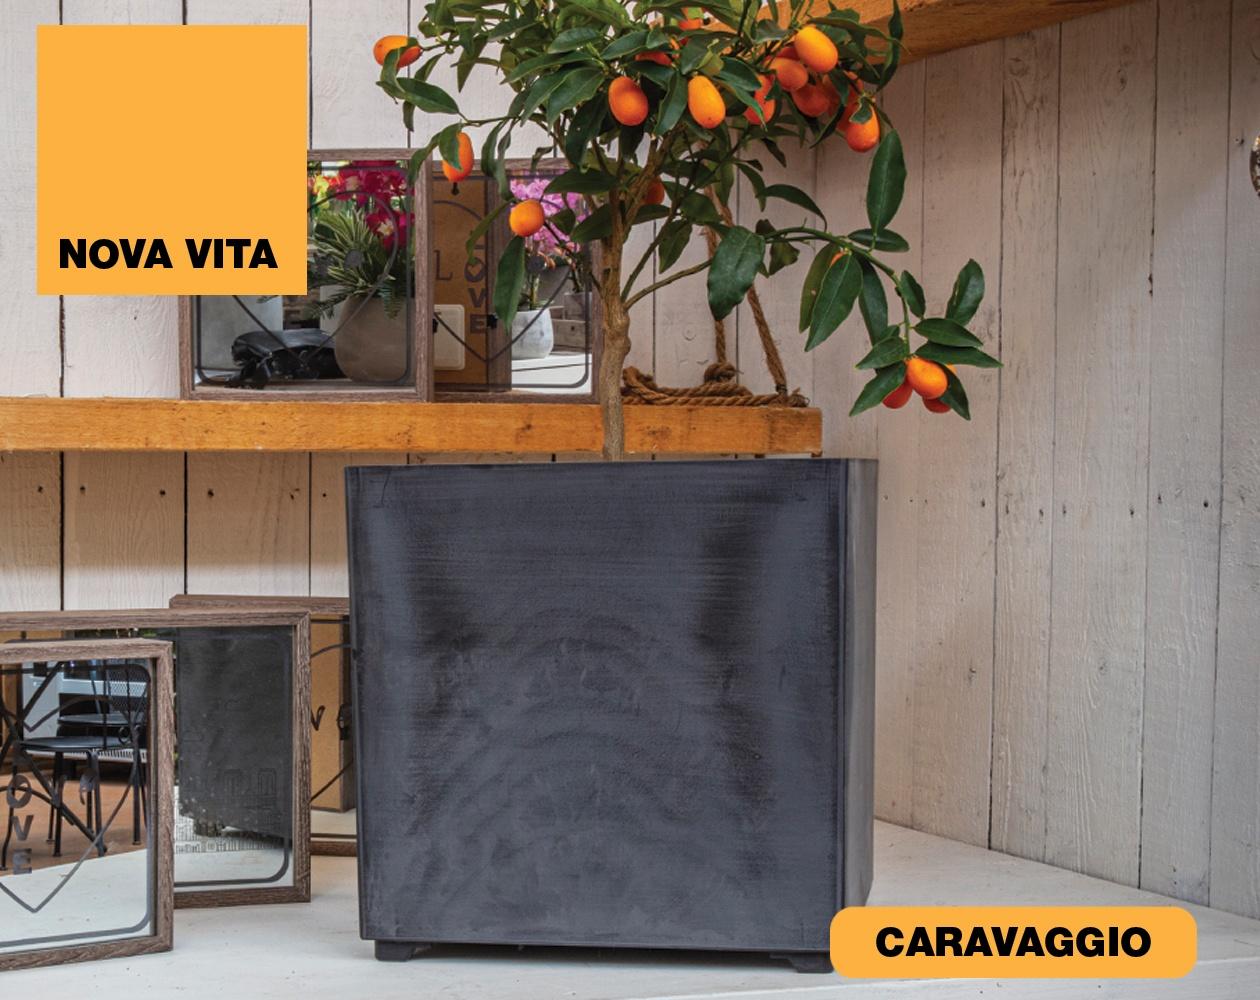 Caravaggio Vasi in plastica riciclata linea Nova Vita Art Plast